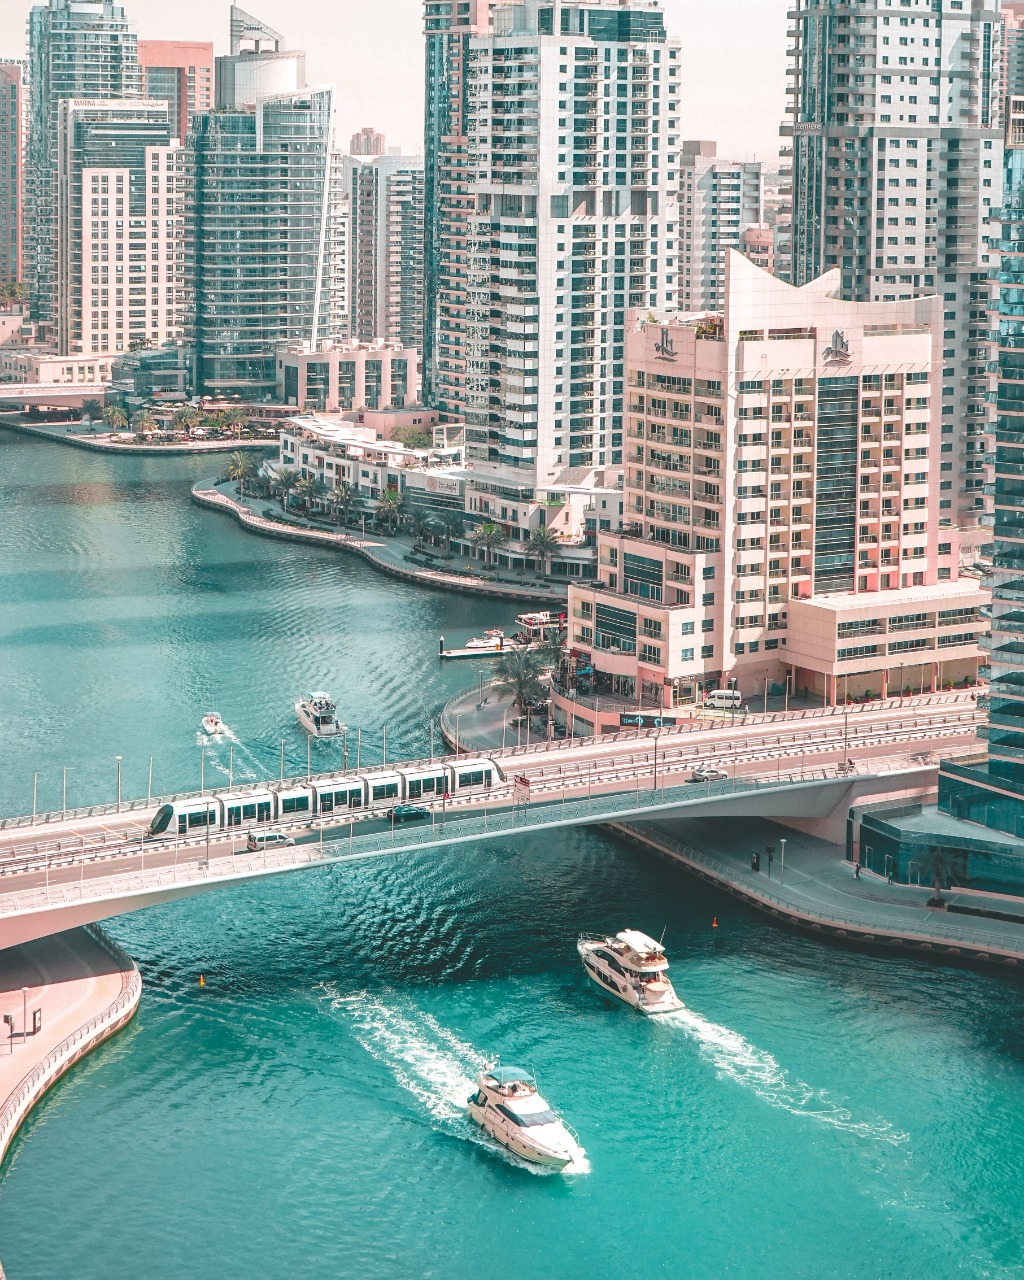 Dubai o oásis na beira do golfo